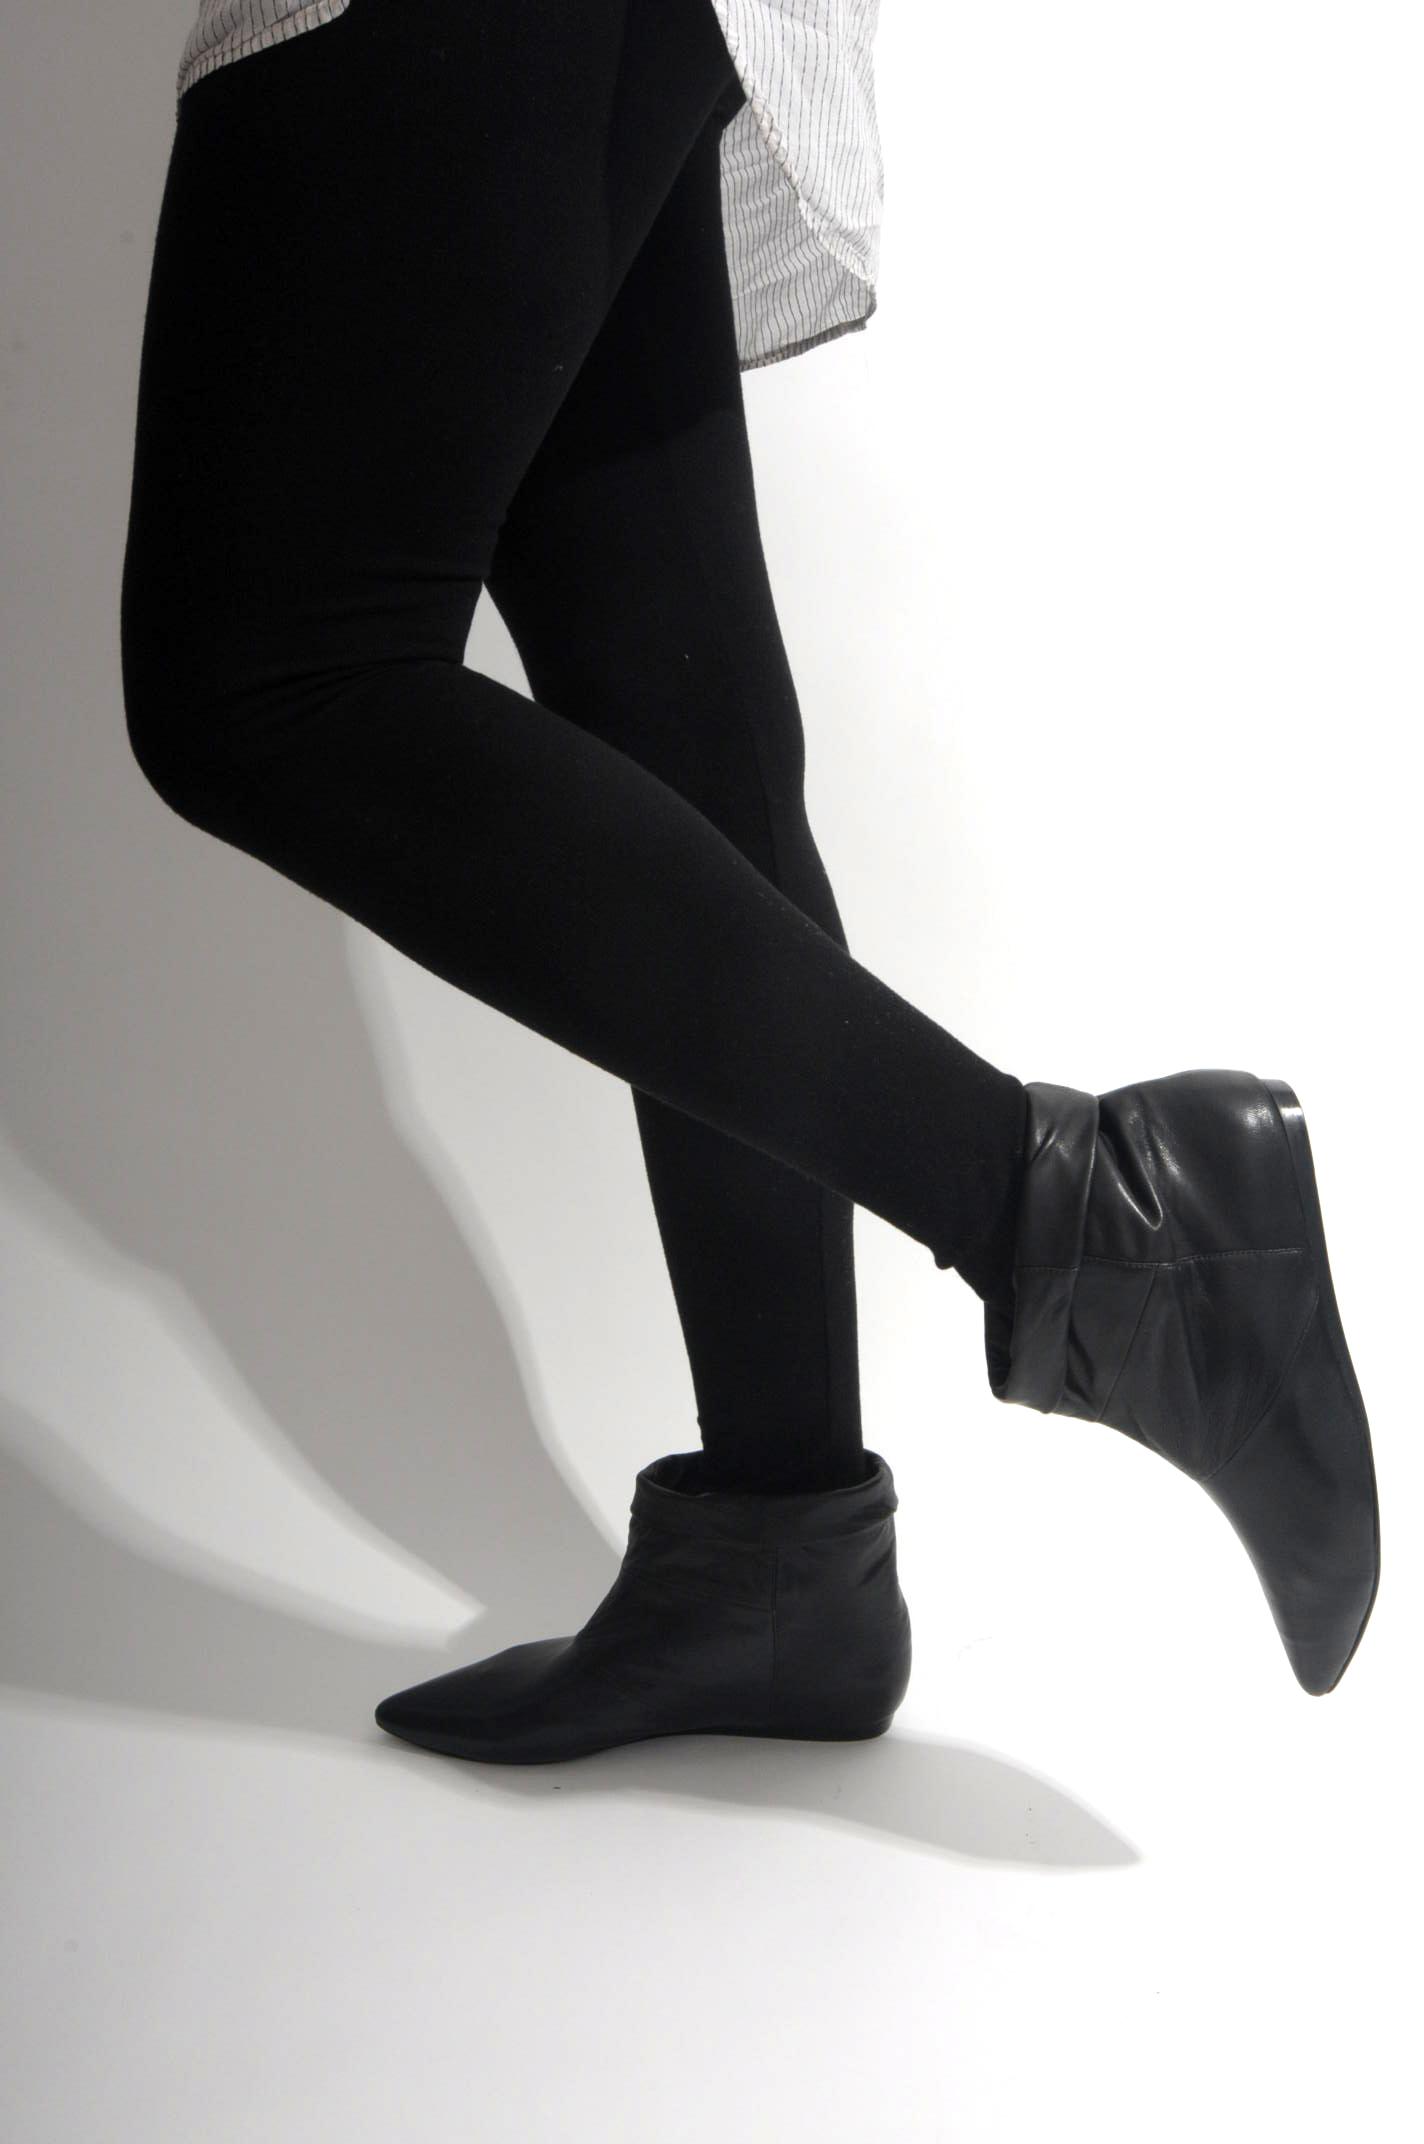 flat boots | KATHRYN AMBERLEIGH